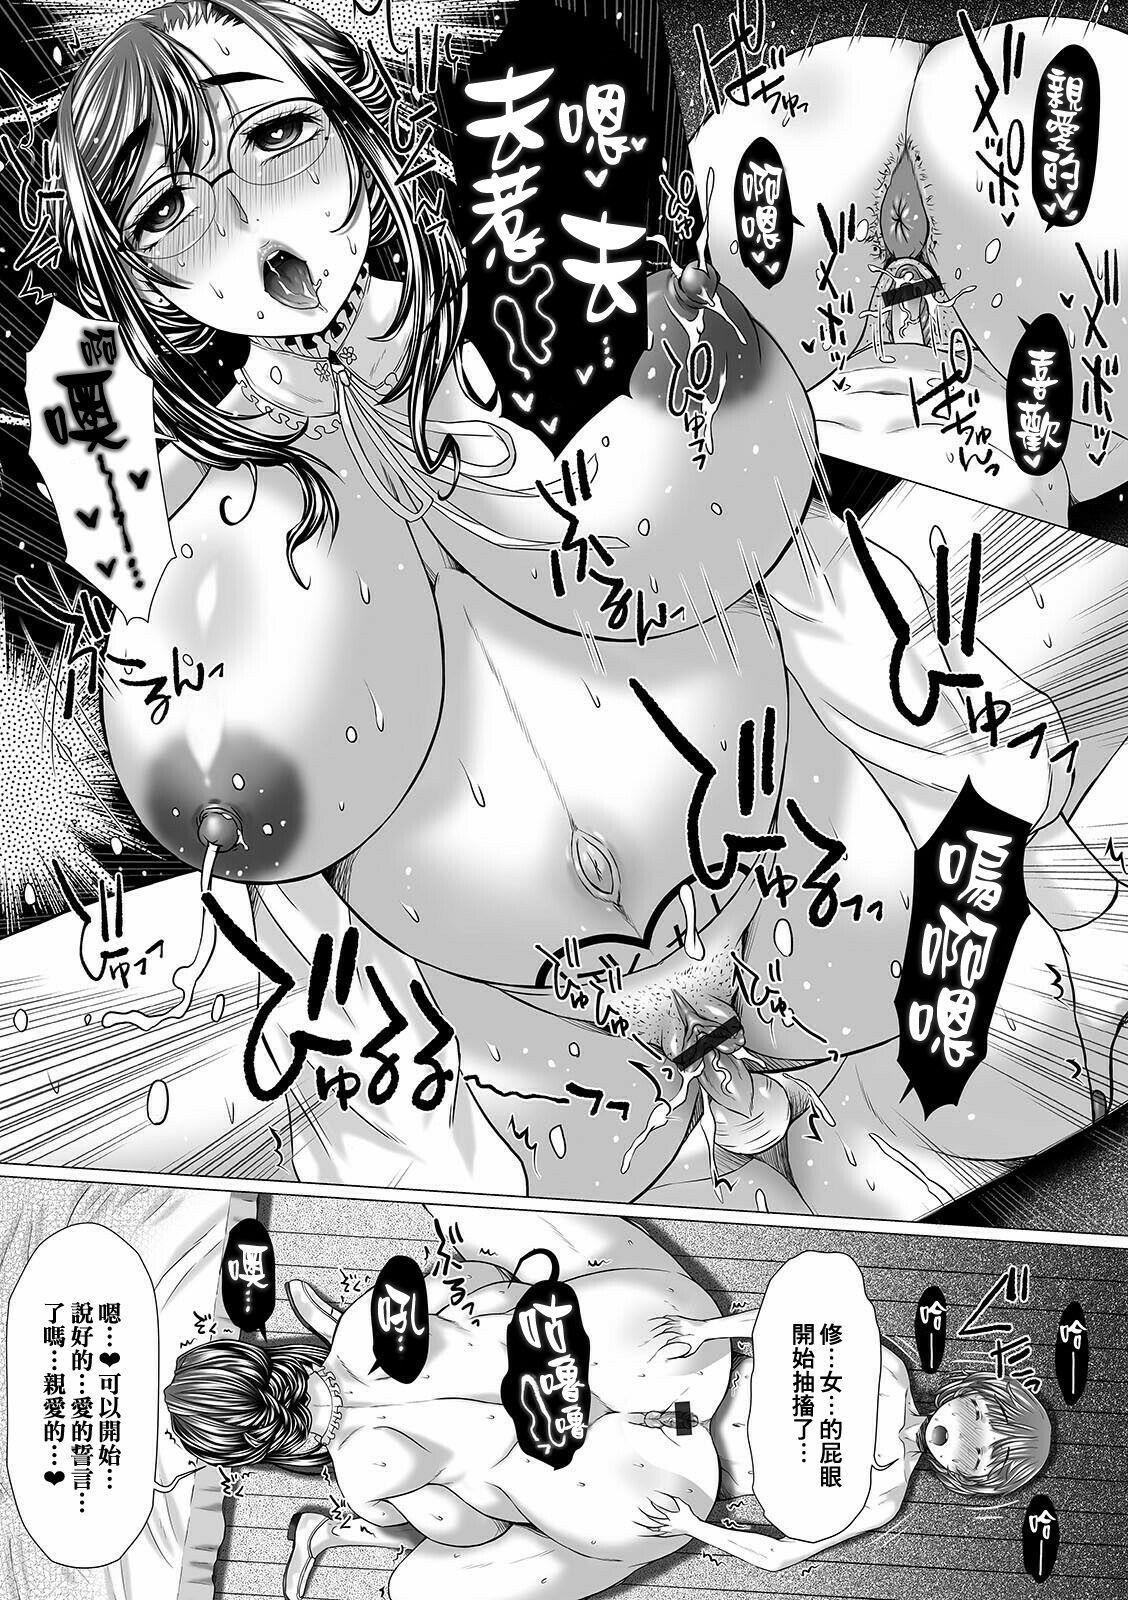 GOFUJYO Sister Chou 2 18